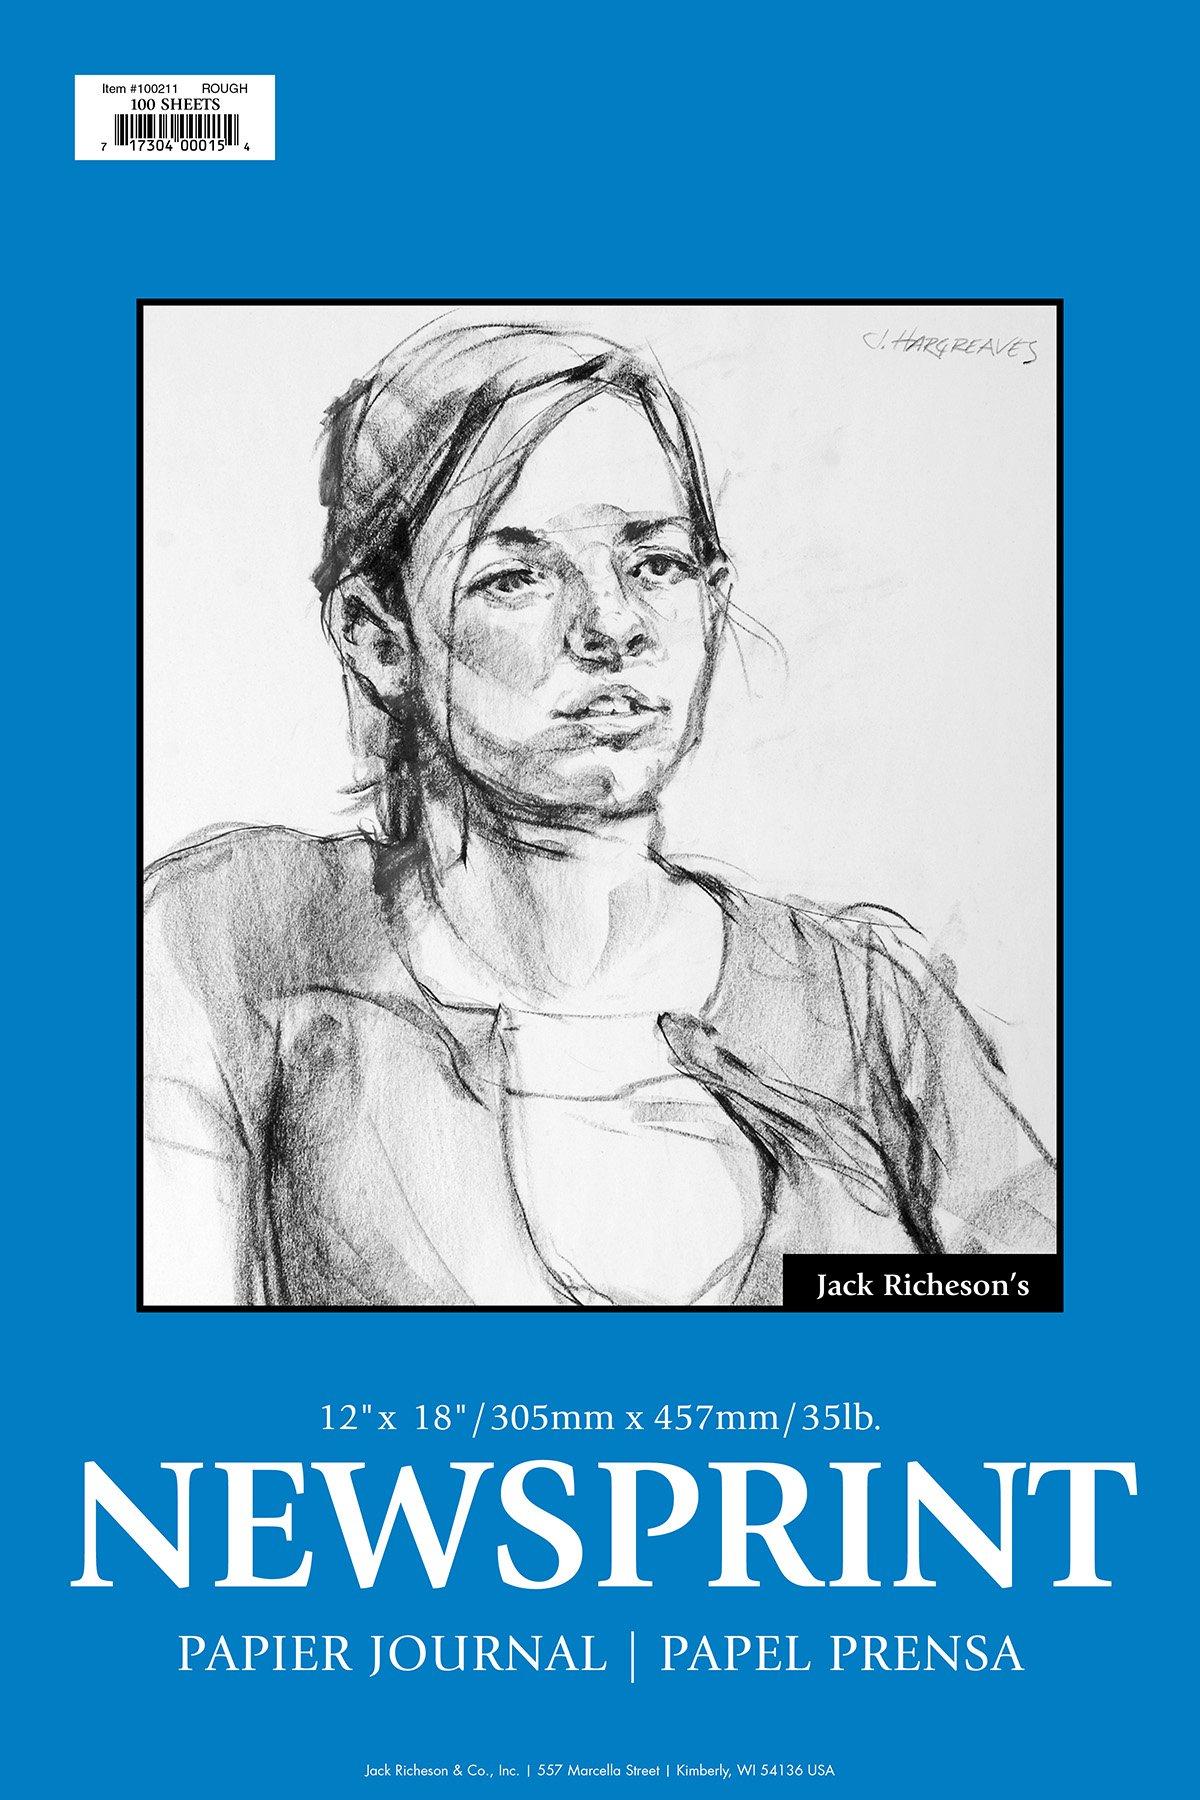 Jack Richeson Rough Newsprint 12'' x 18'' 100 Sheet by Jack Richeson